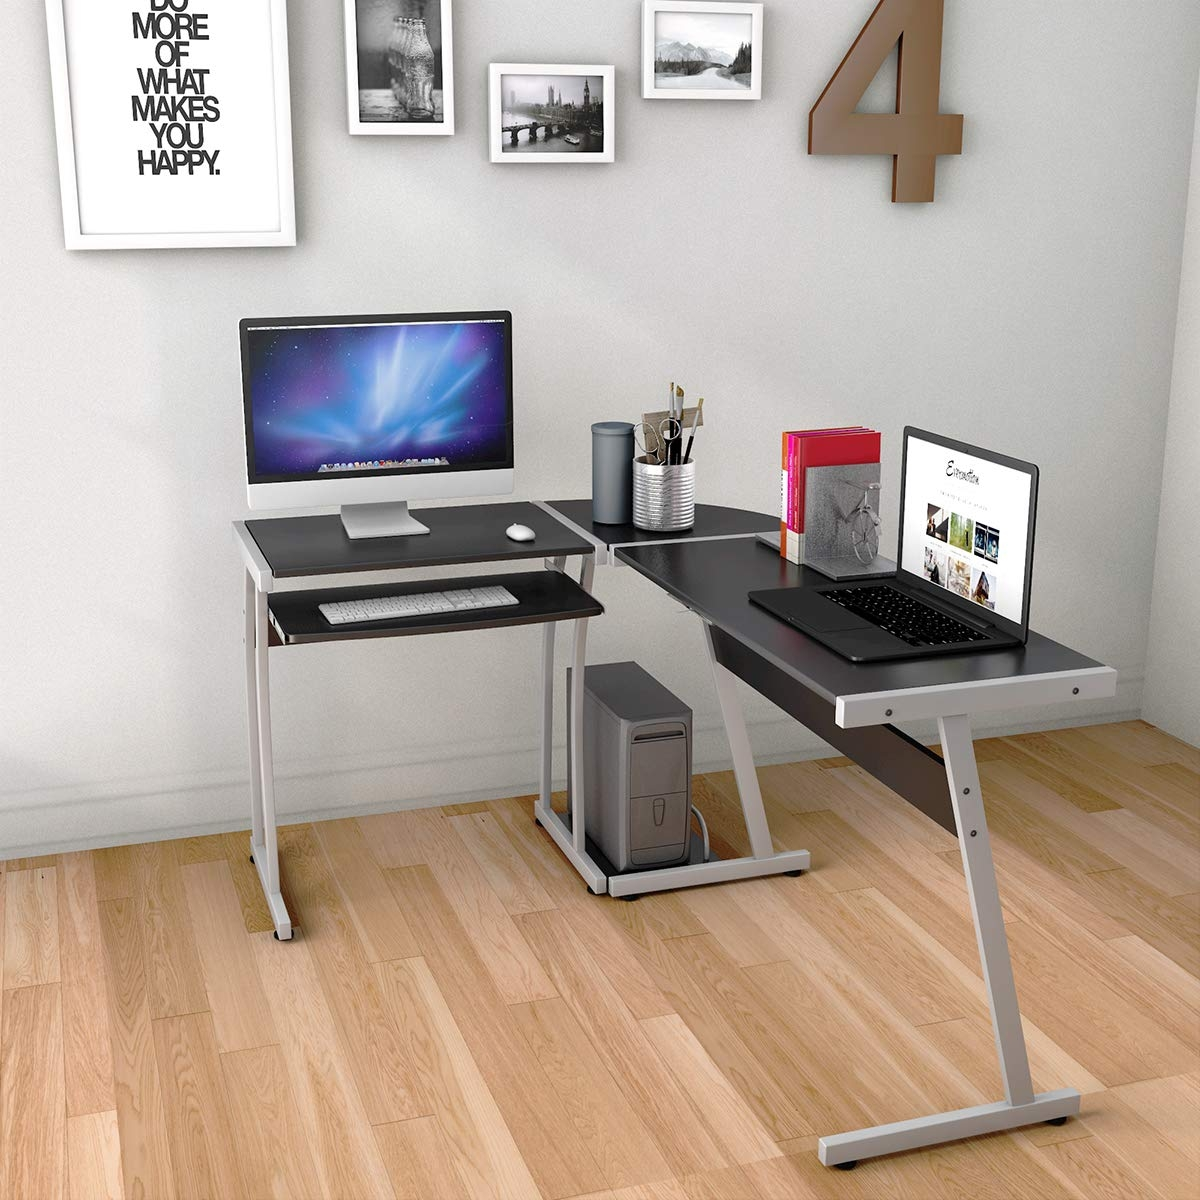 Large L-Shaped Wood PC Desk